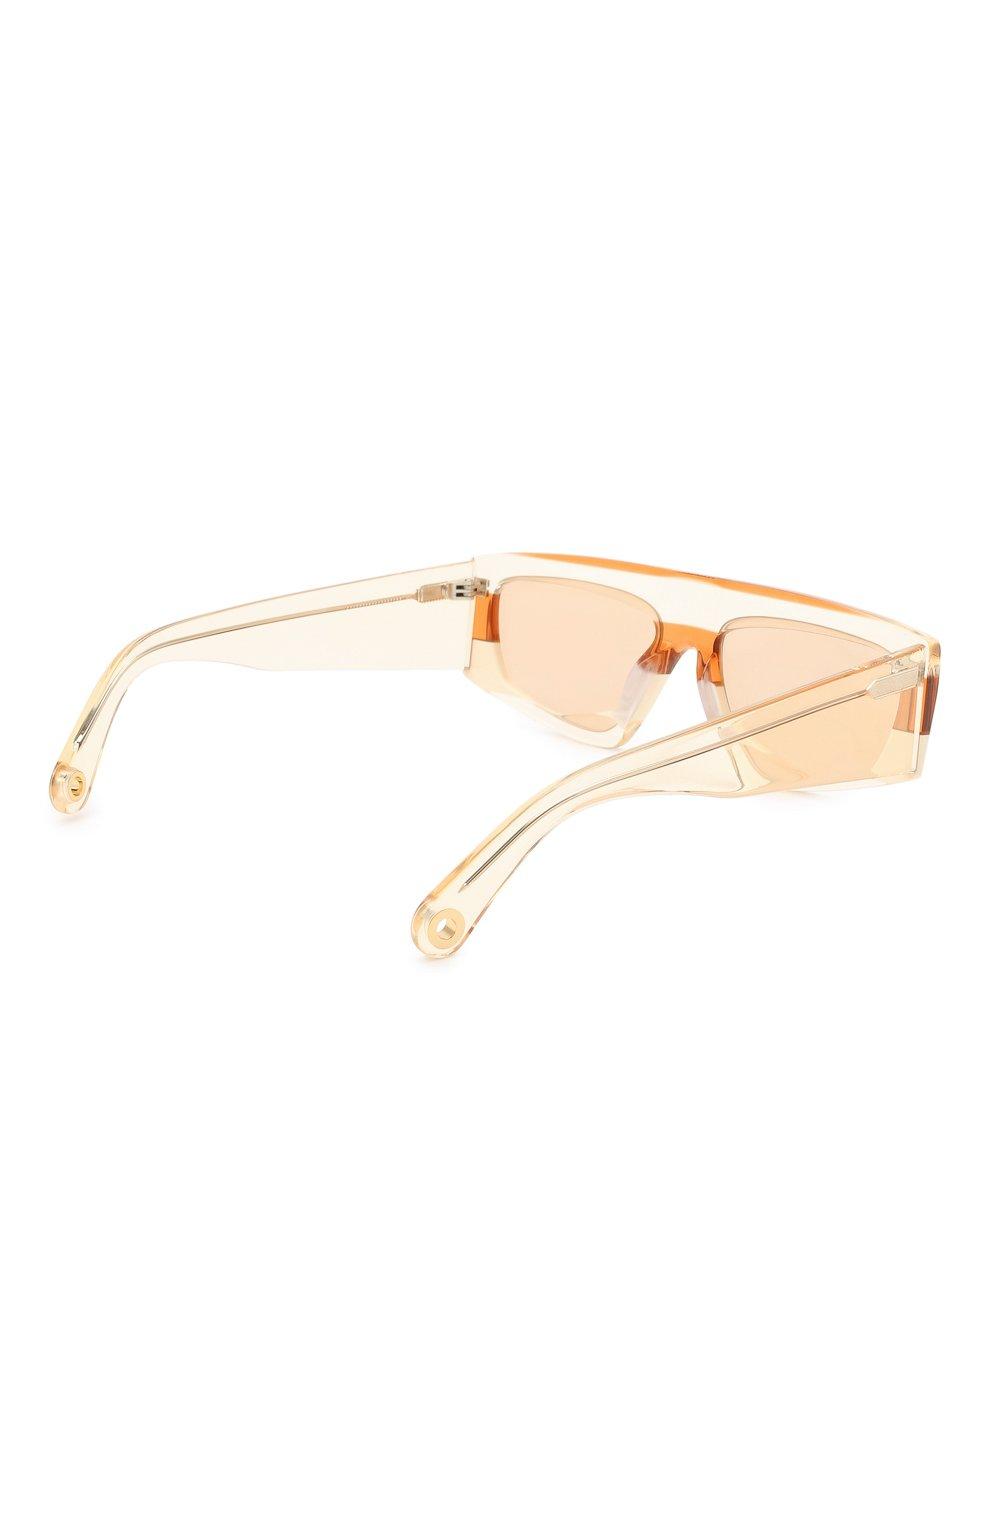 Женские солнцезащитные очки JACQUEMUS оранжевого цвета, арт. LES LUNETTES YAUC0 SHADE 0F 0RANGE | Фото 5